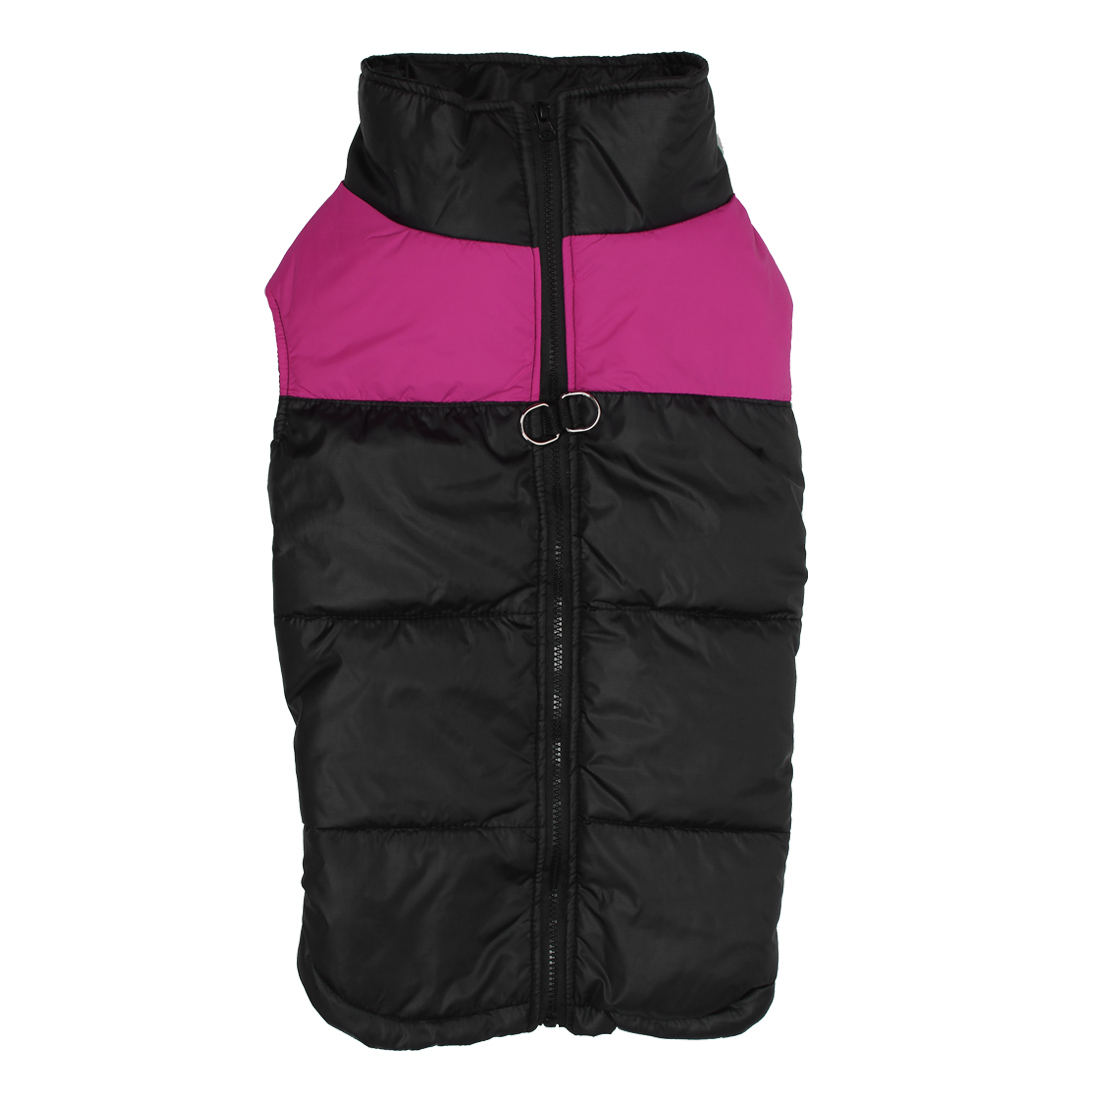 Pet Dog Puppy Jacket Winter Coat Clothes Warm Vest Apparel Pink Size 3XL